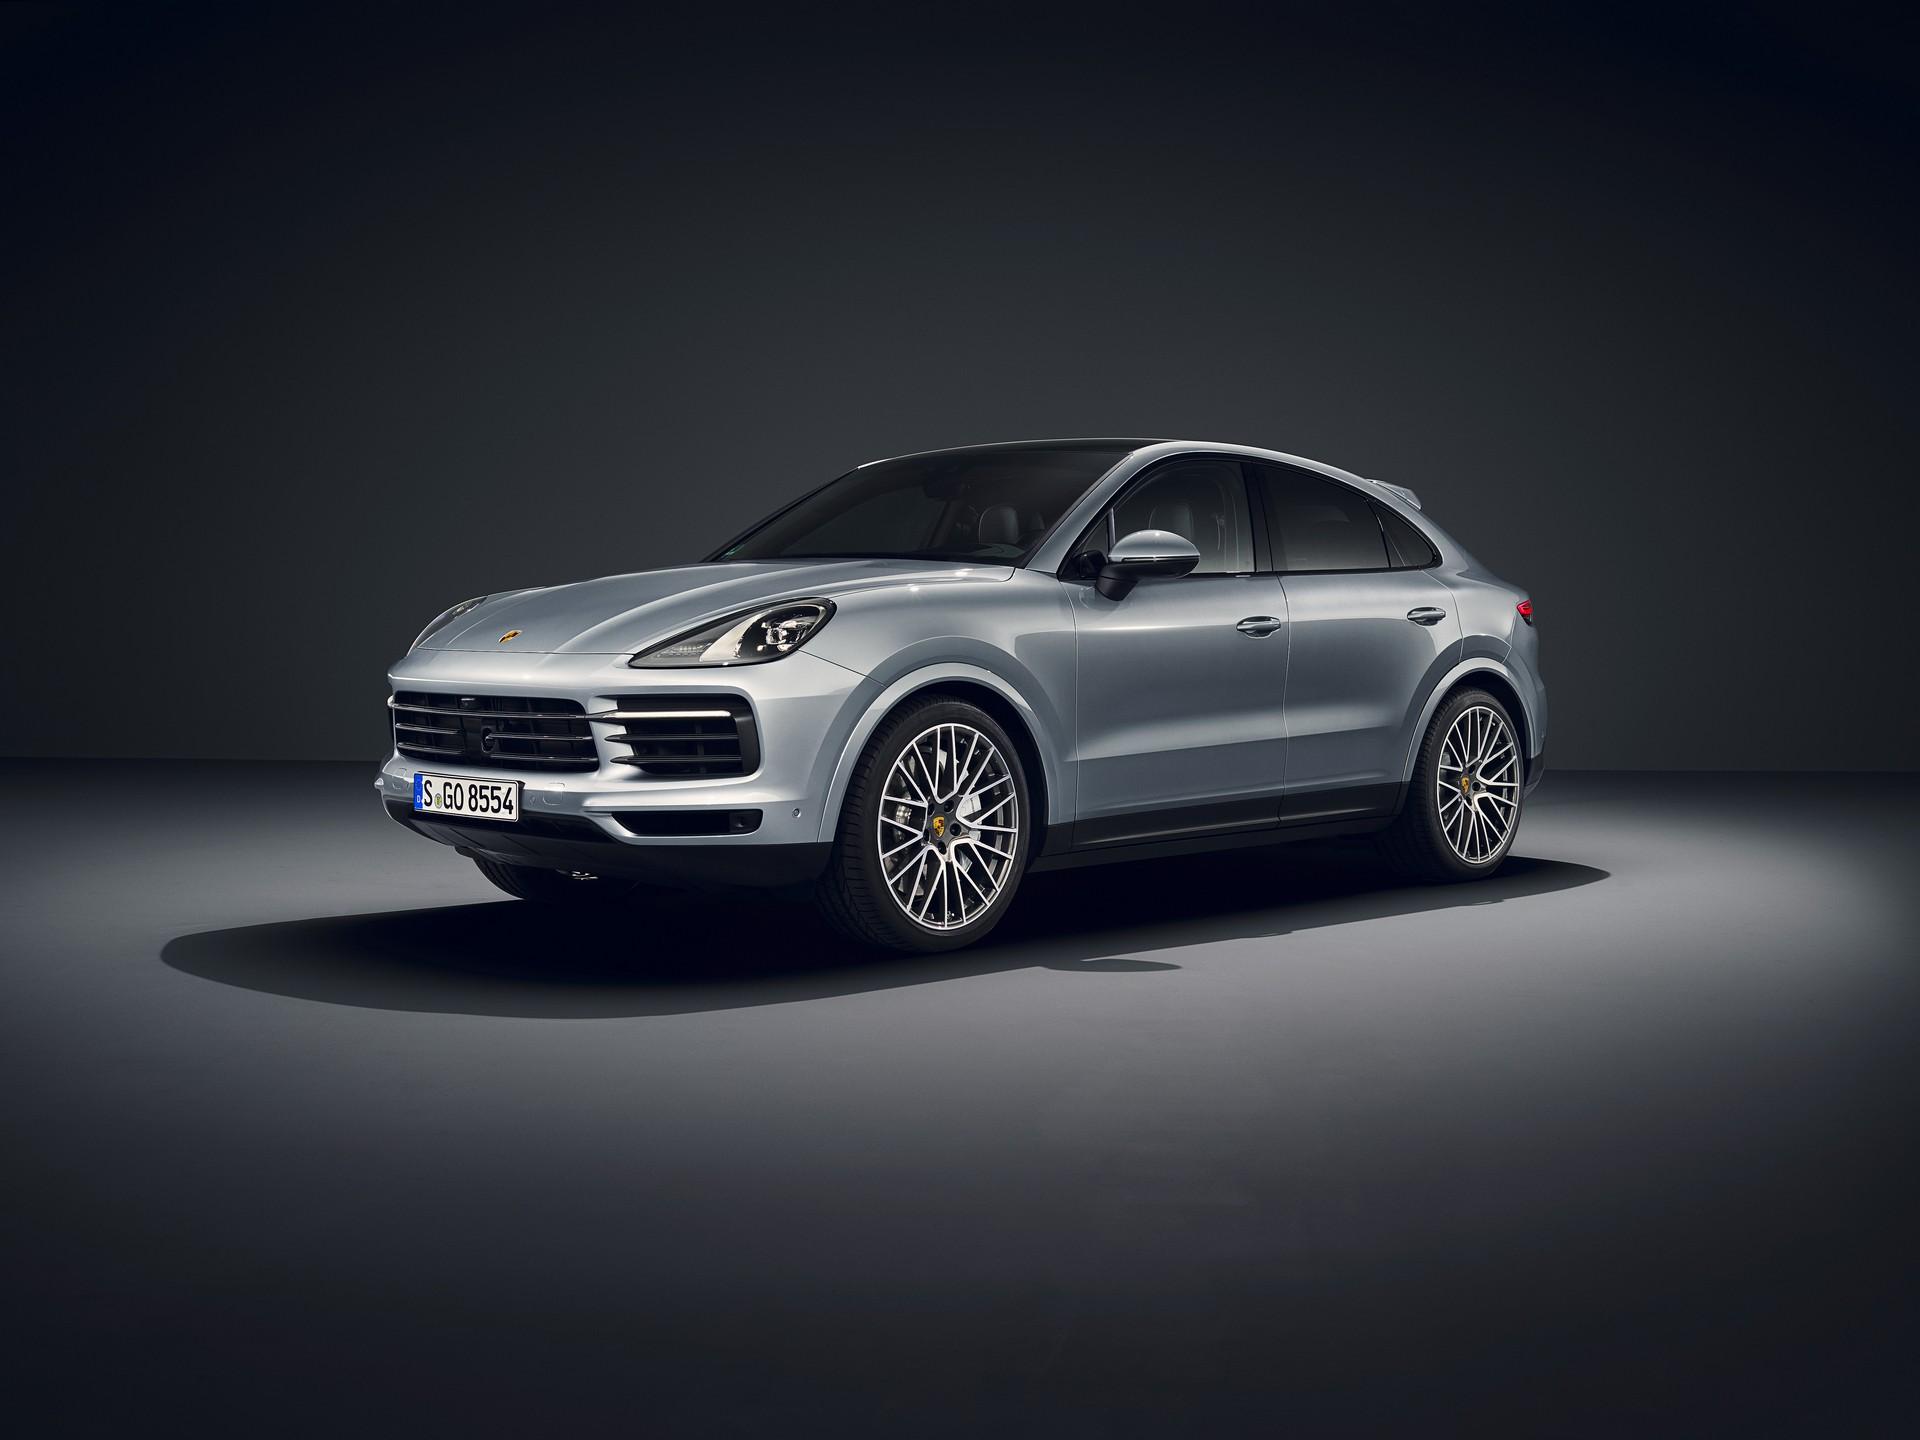 113edfd4-2020-porsche-cayenne-s-coupe-1